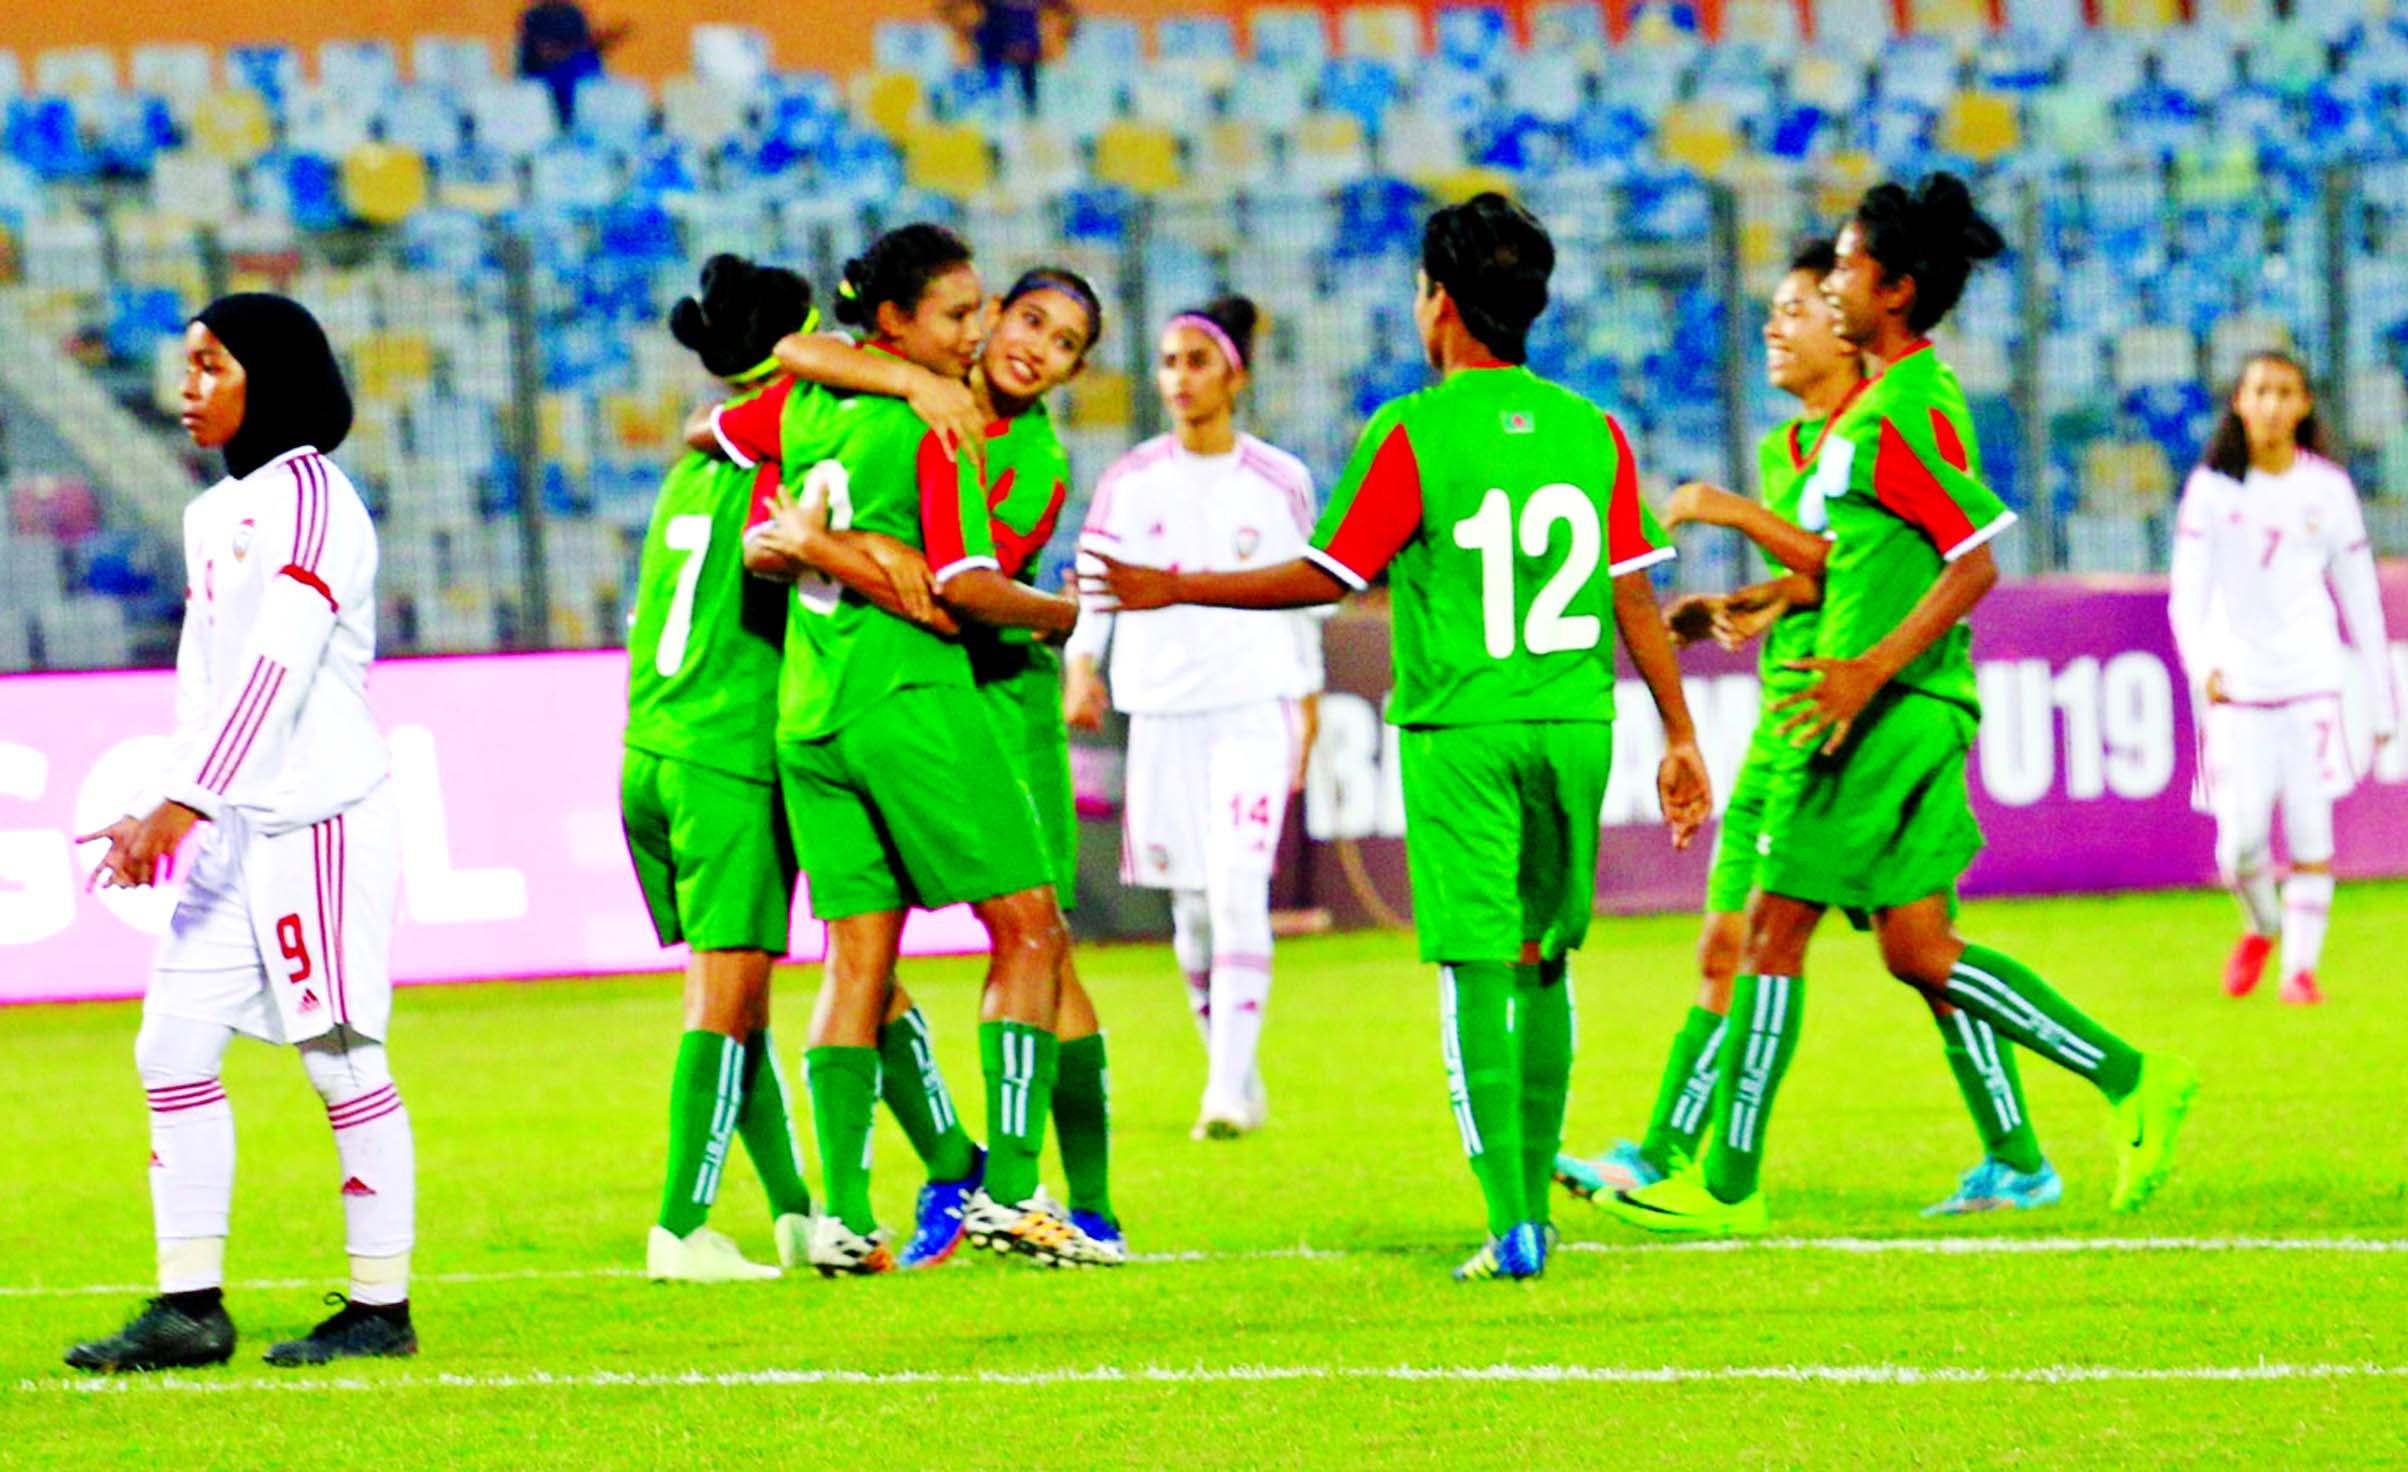 BD get off to flying start beating UAE 2-0